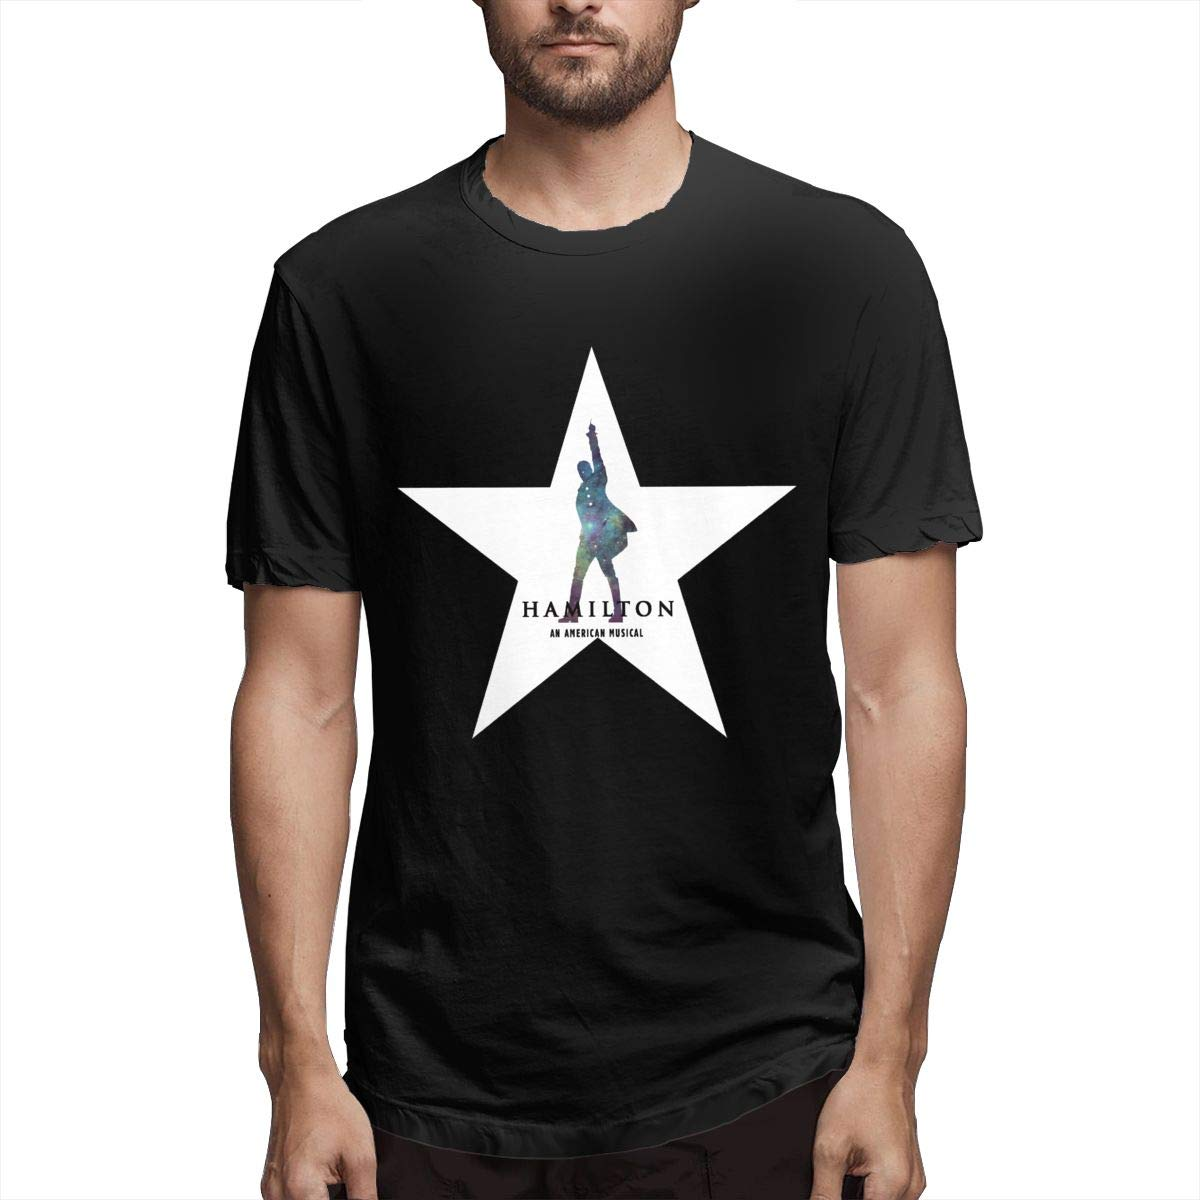 Cheny S Musicals Hamilton T-shirts Tops O-neck T